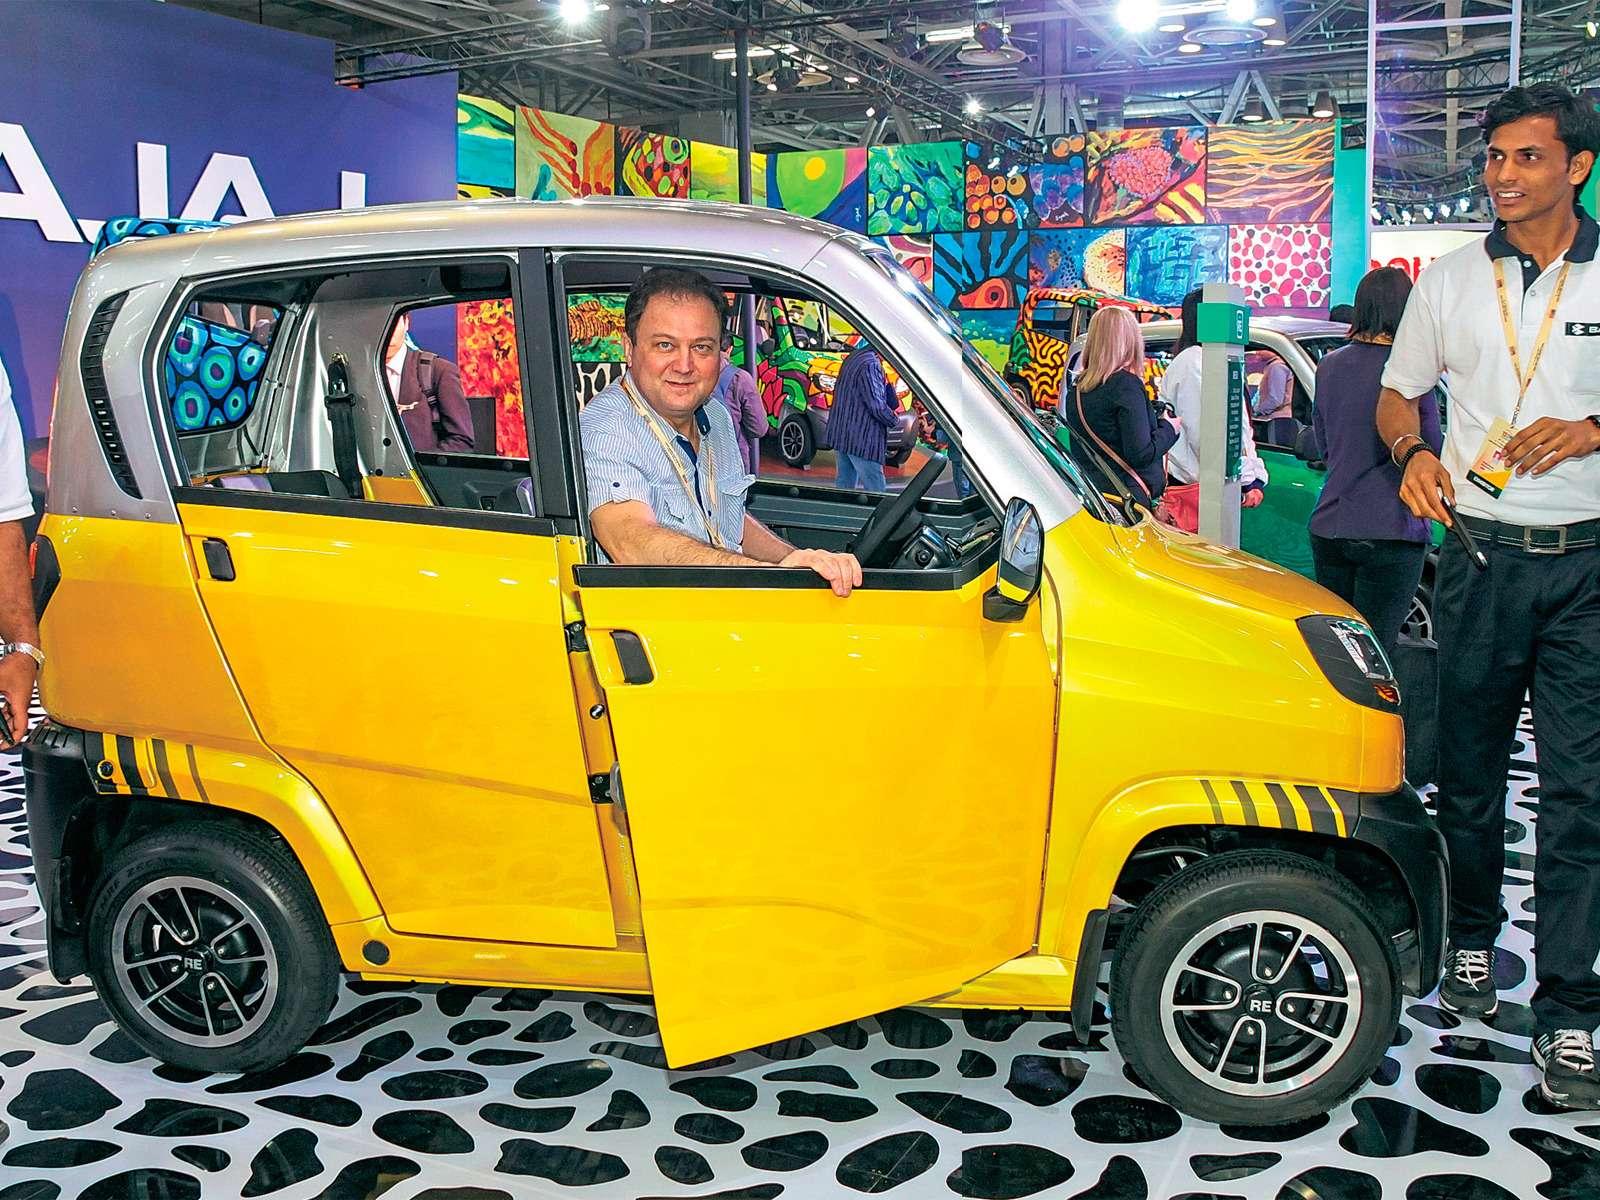 Автосалон вДели: индийское кино — фото 265144